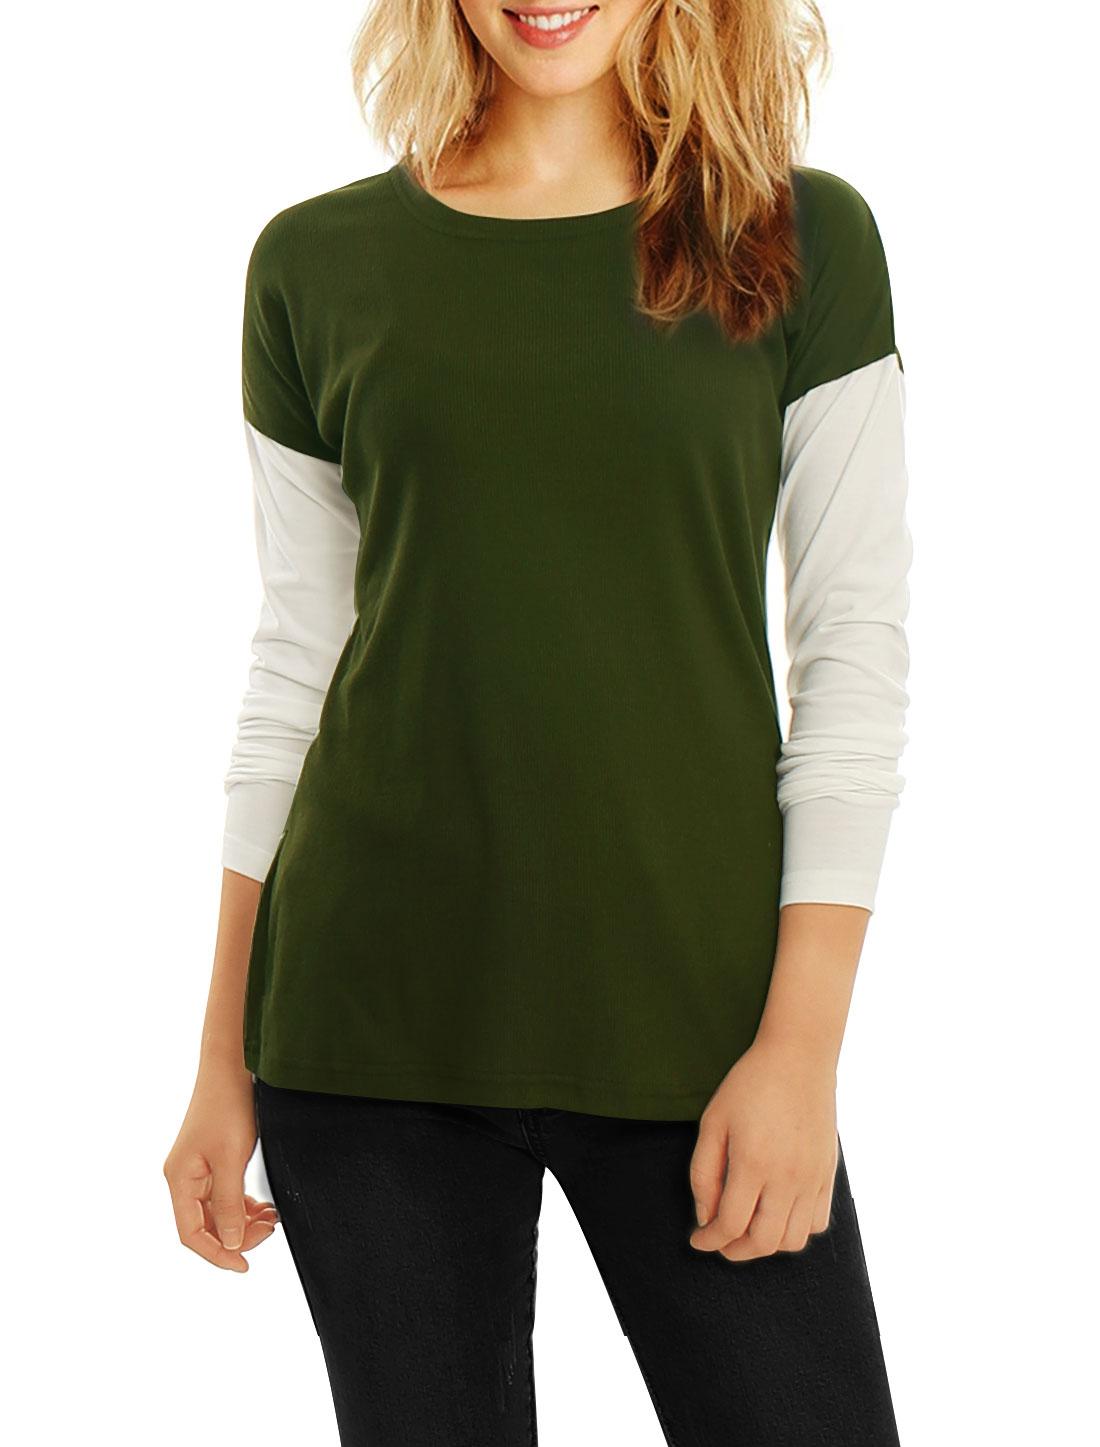 Women Color Block Side-Slit Paneled Slim Fit Ribbed Top Green XL